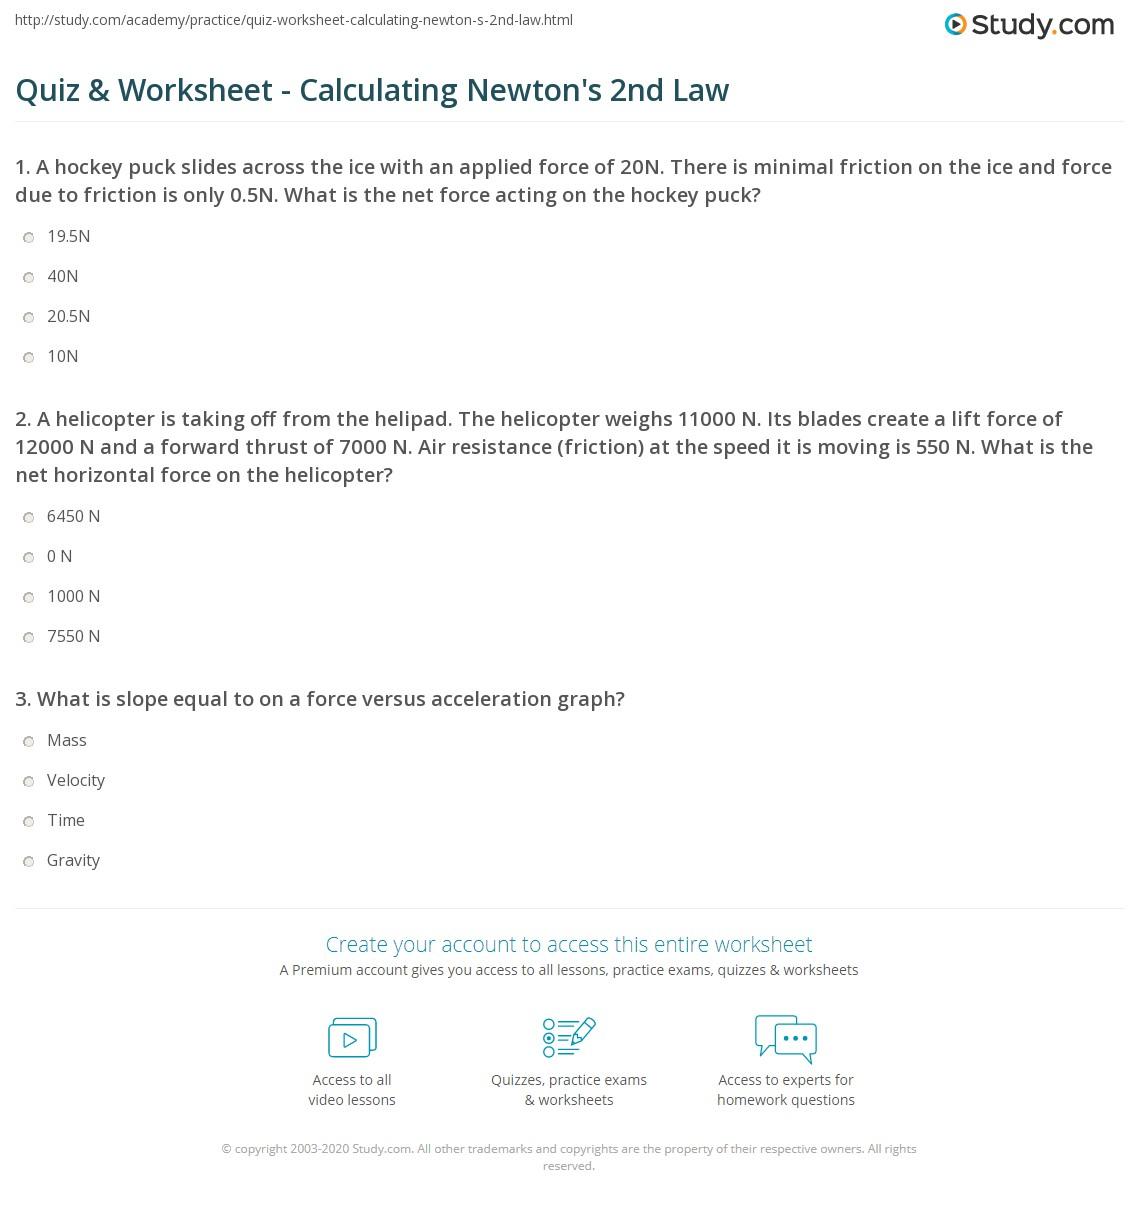 Quiz & Worksheet - Calculating Newton's 2nd Law | Study.com